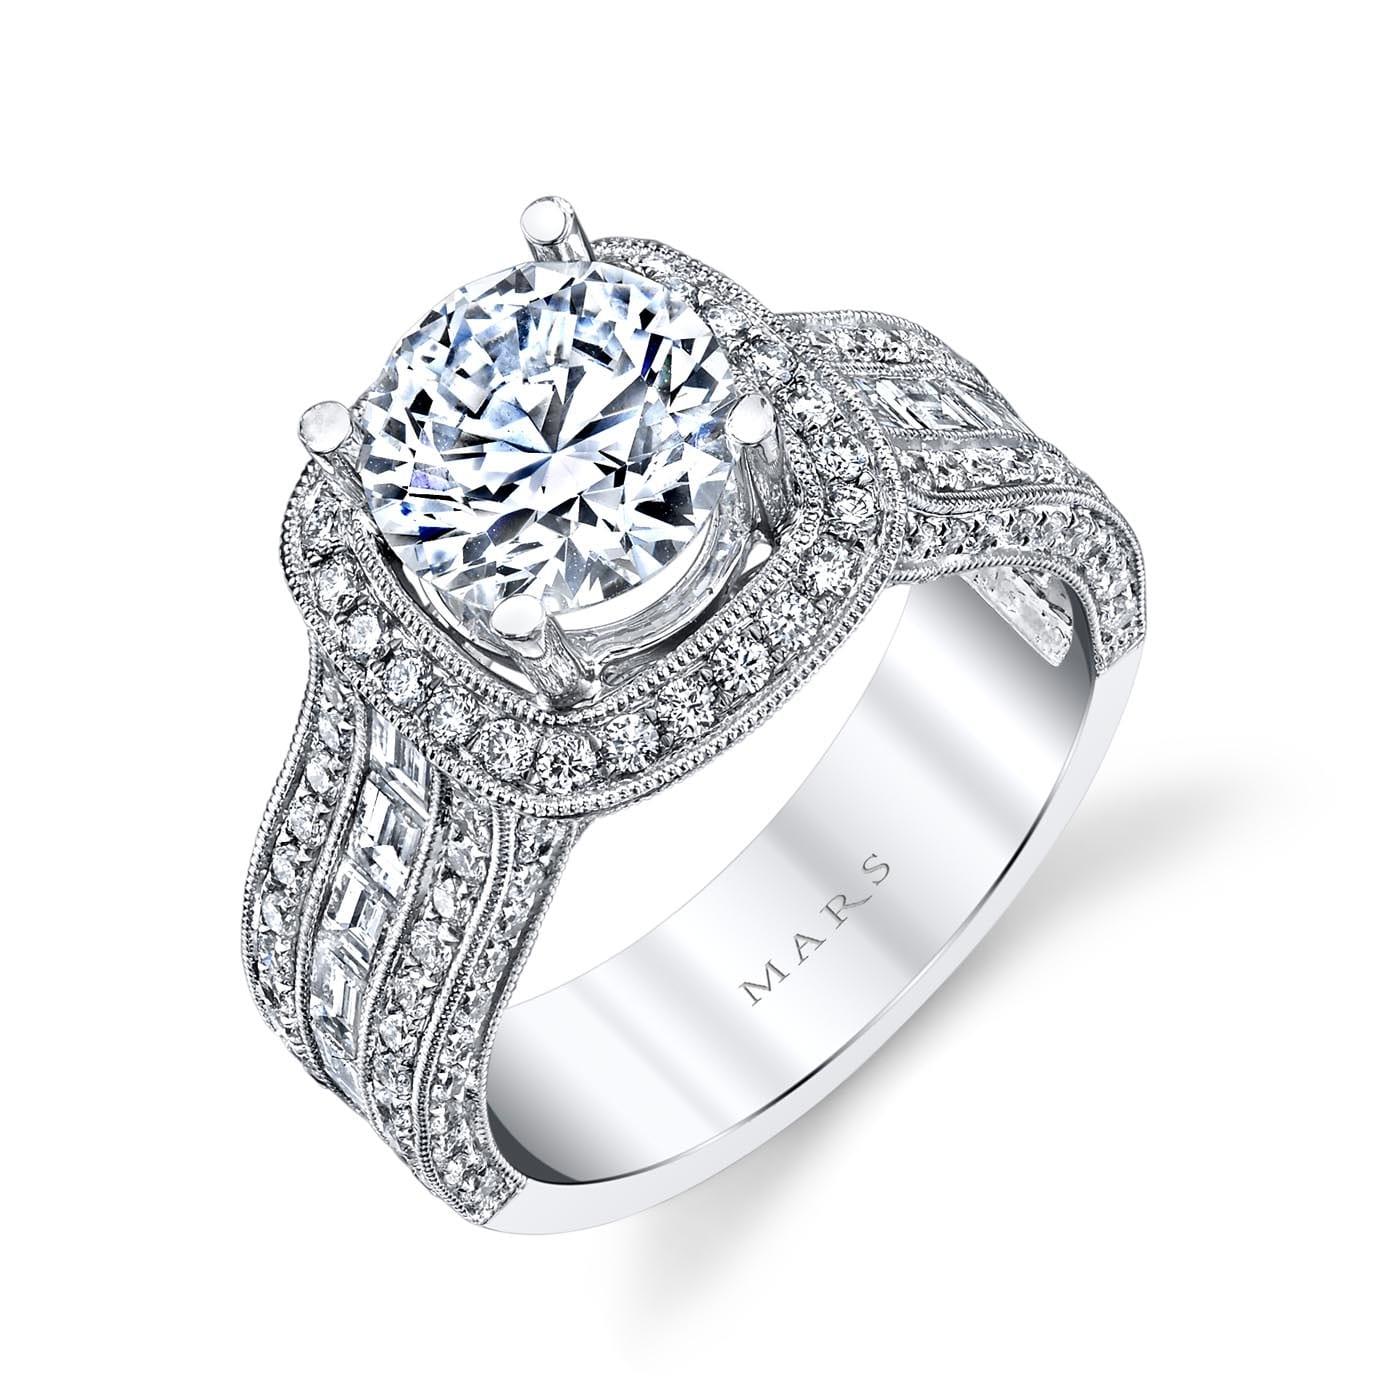 Halo Engagement RingStyle #: MARS 26508